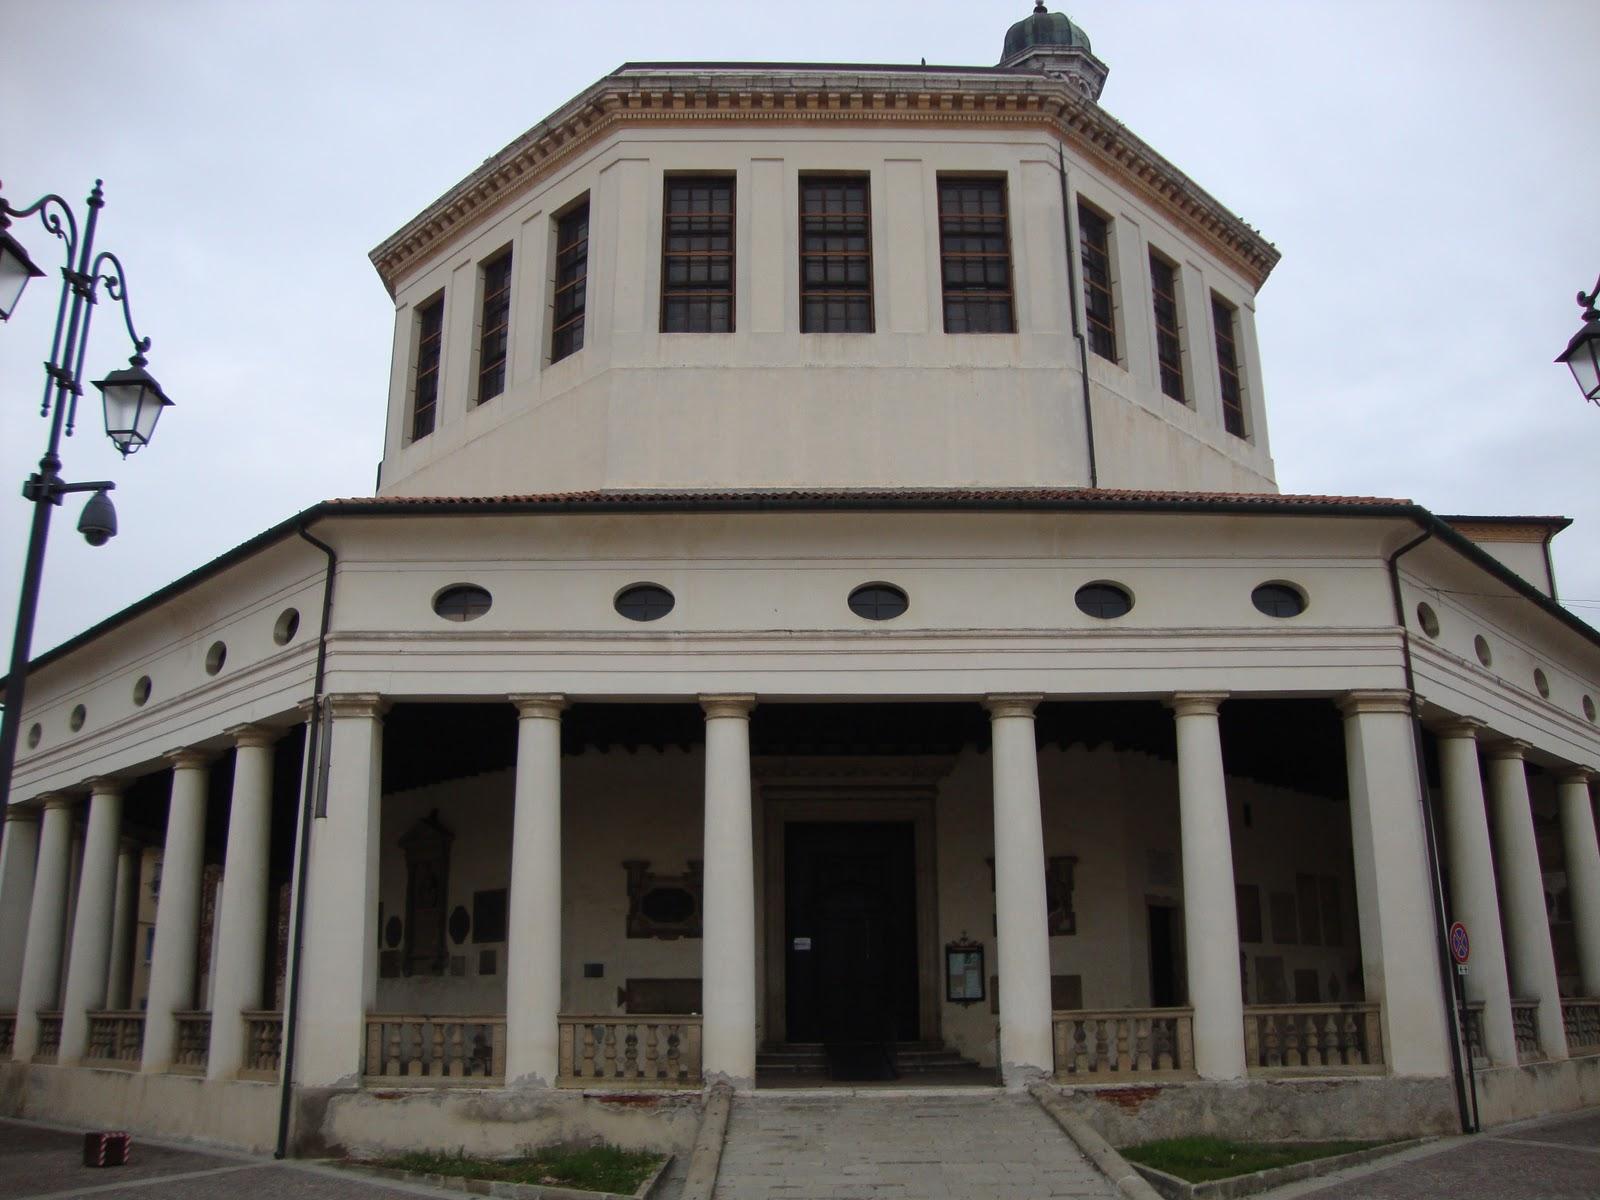 arquitectura arte sacro y liturgia del medievo al